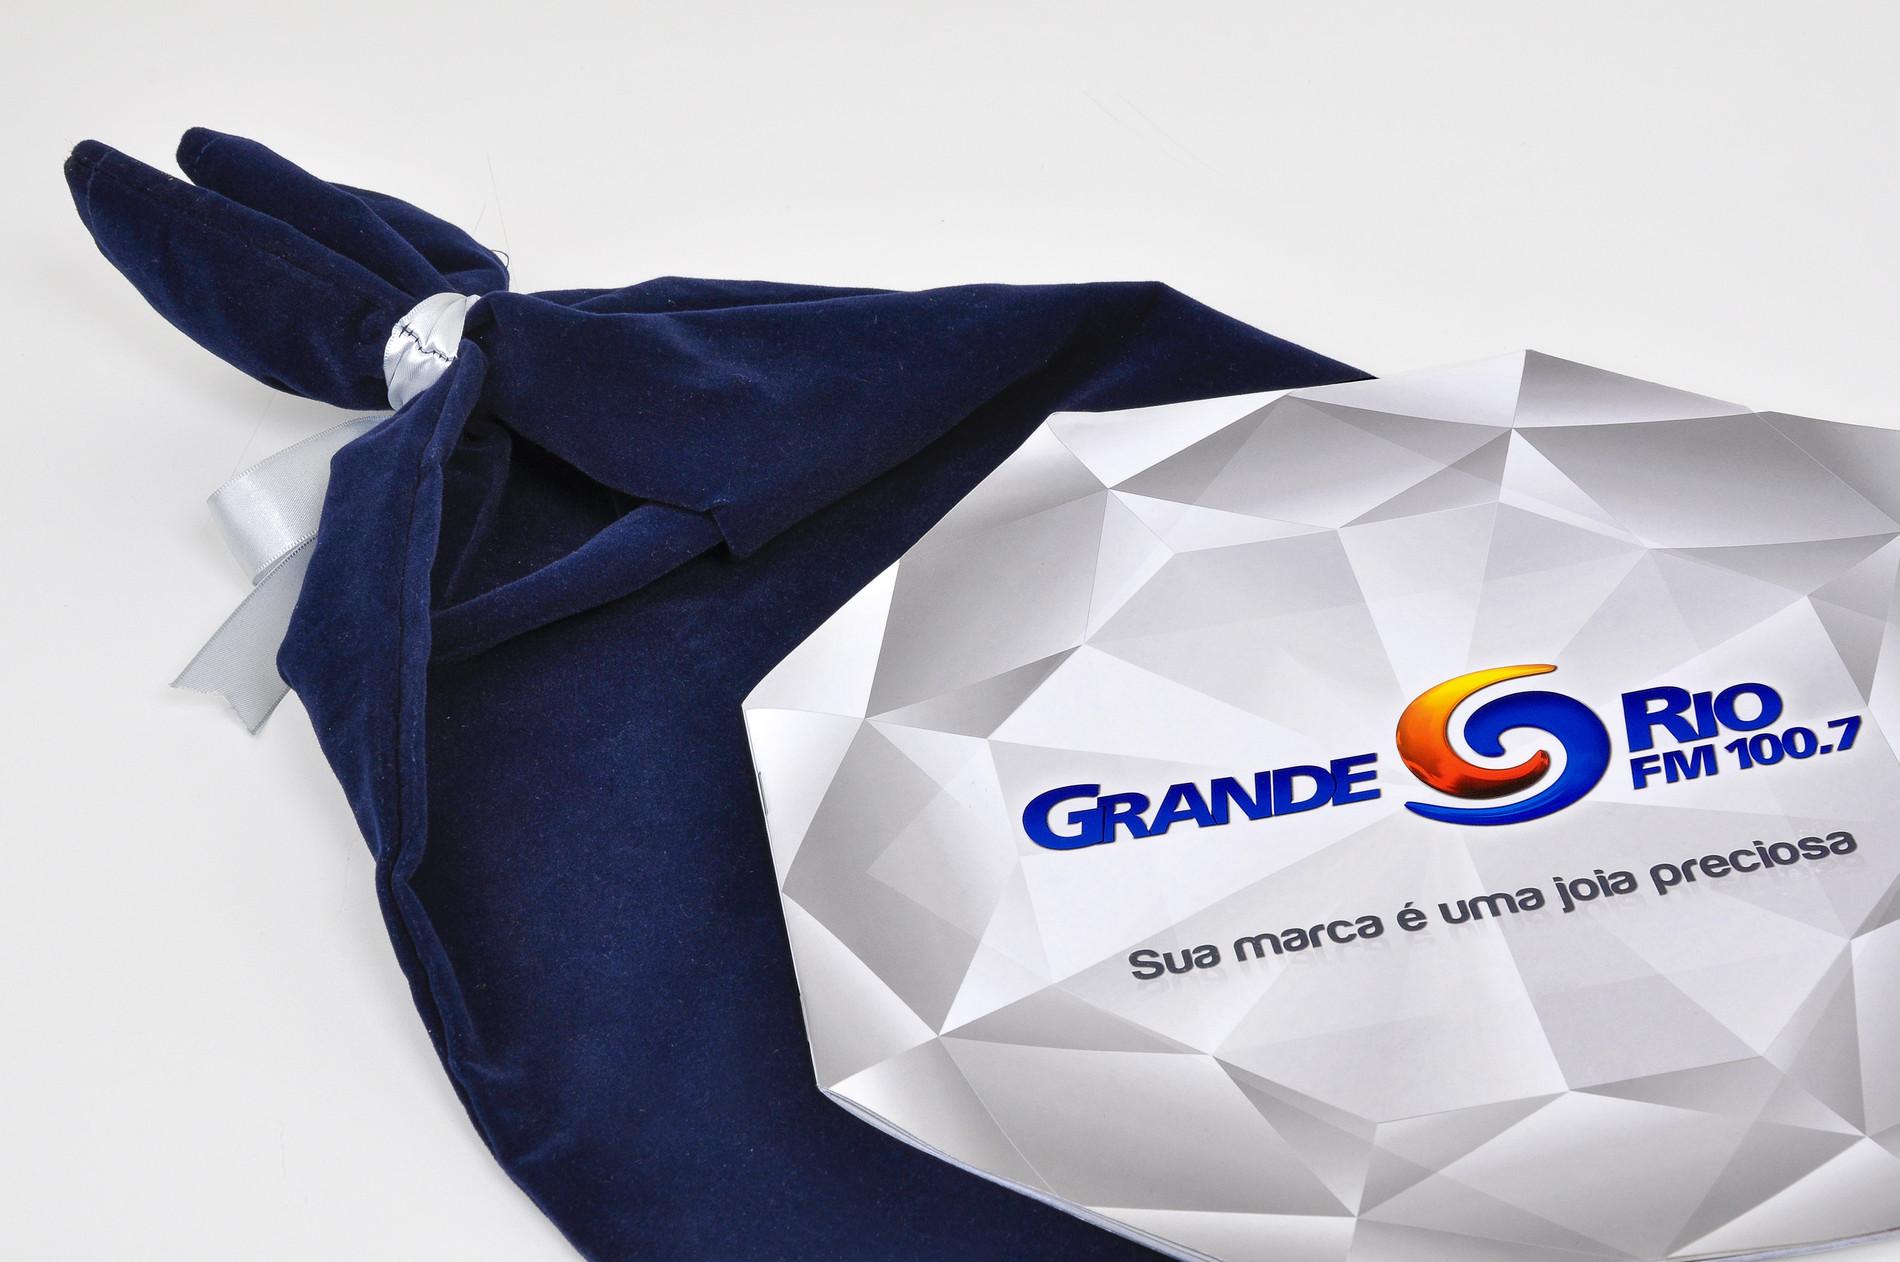 Projeto Rádio Grande Rio